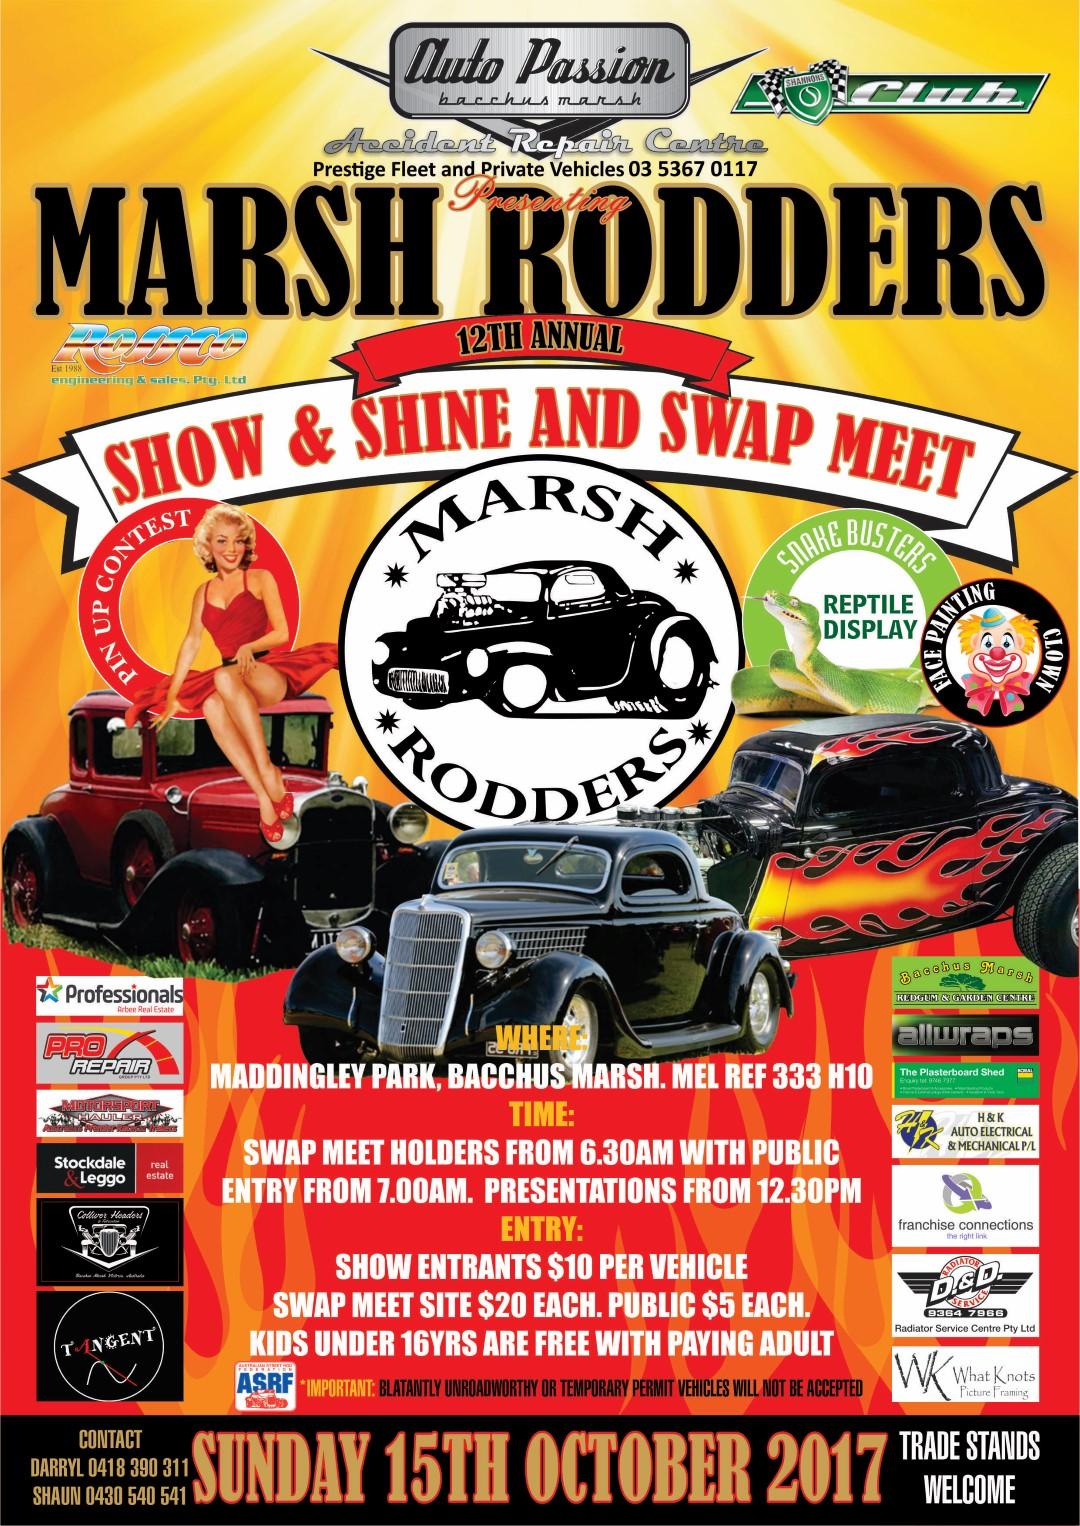 Marsh Rodders Annual Show n Shine & Swap Meet flyer